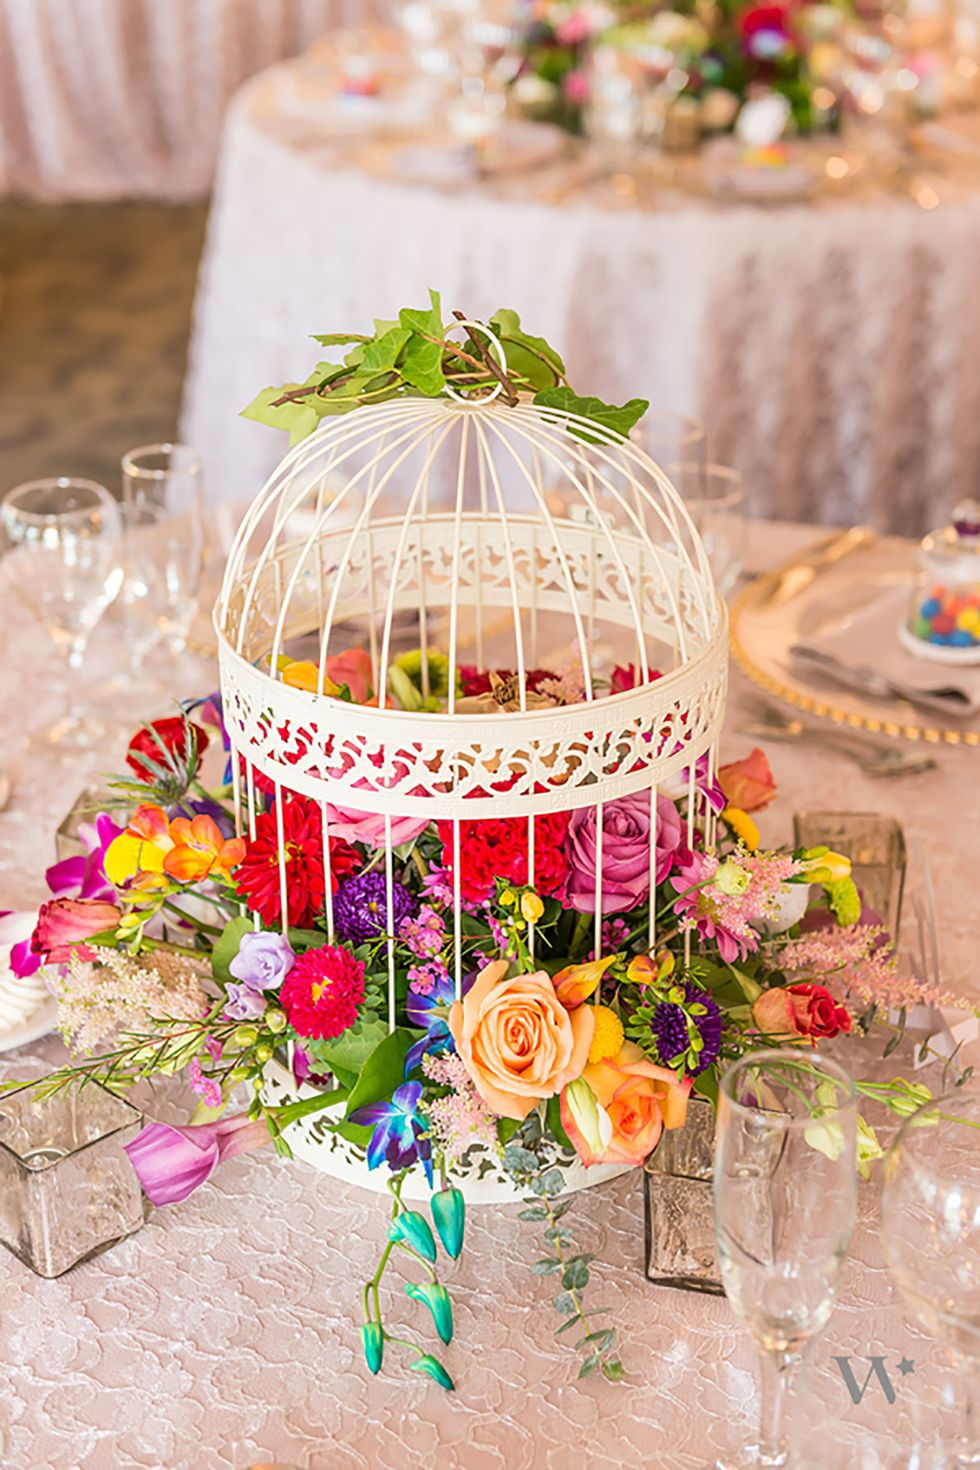 12 Elegant Ideas for a Garden Tea Party| Party Ideas, Party Games, Party Food, DIY Party Decor, DIY Party Decorations, DIY Party Favors, Party Themes, Party Themes for Kids #DIYPartyFavors #DIYPartyDecor #PartyIdeas #TeaPartyBirthday